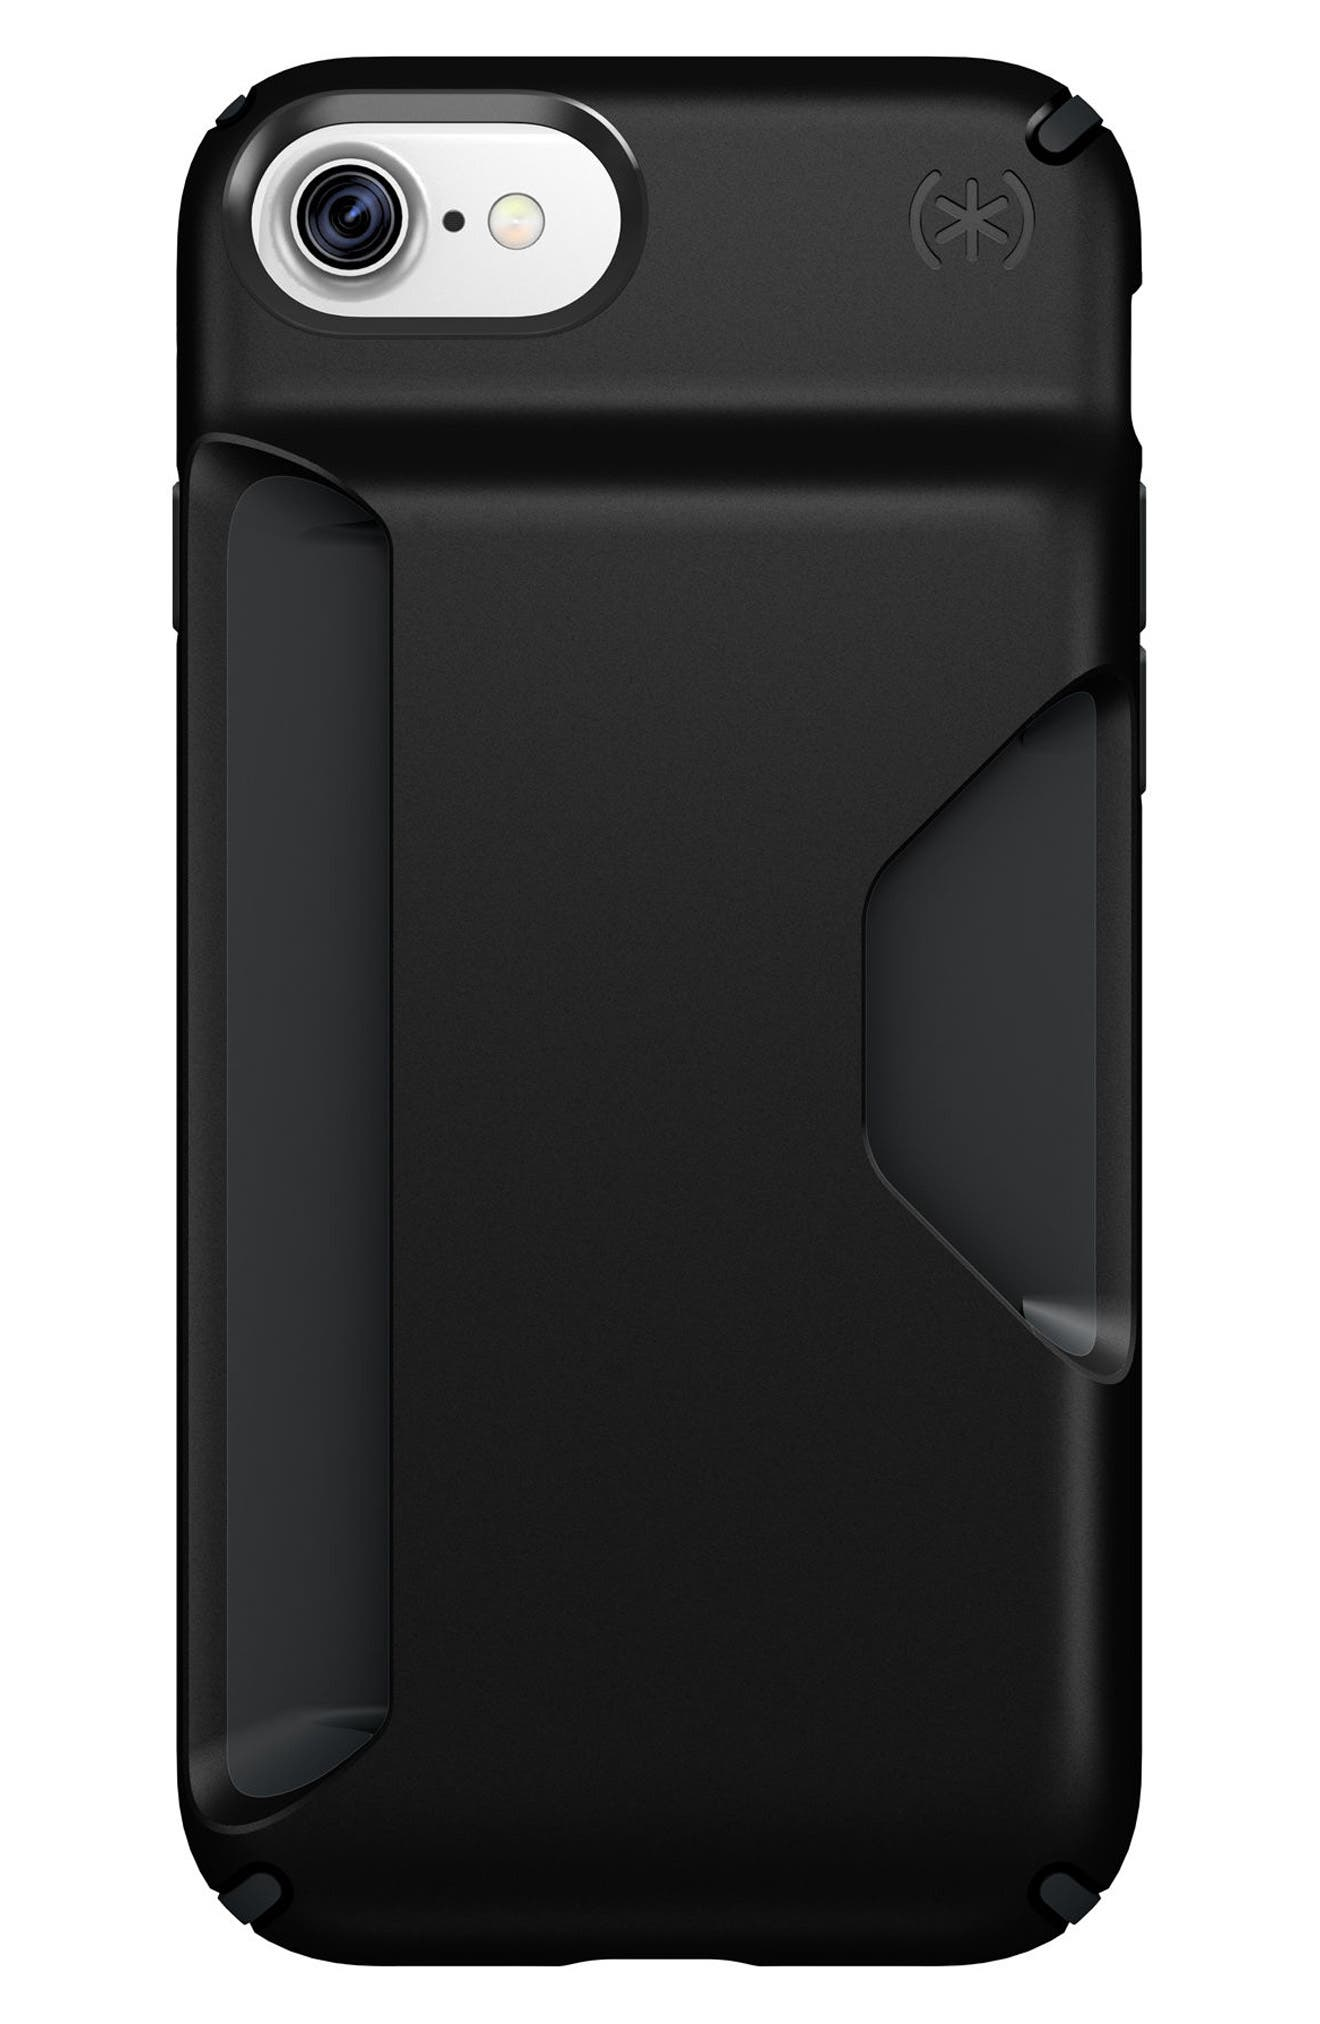 Main Image - Speck Presidio Wallet iPhone 6/6s/7/8 Case